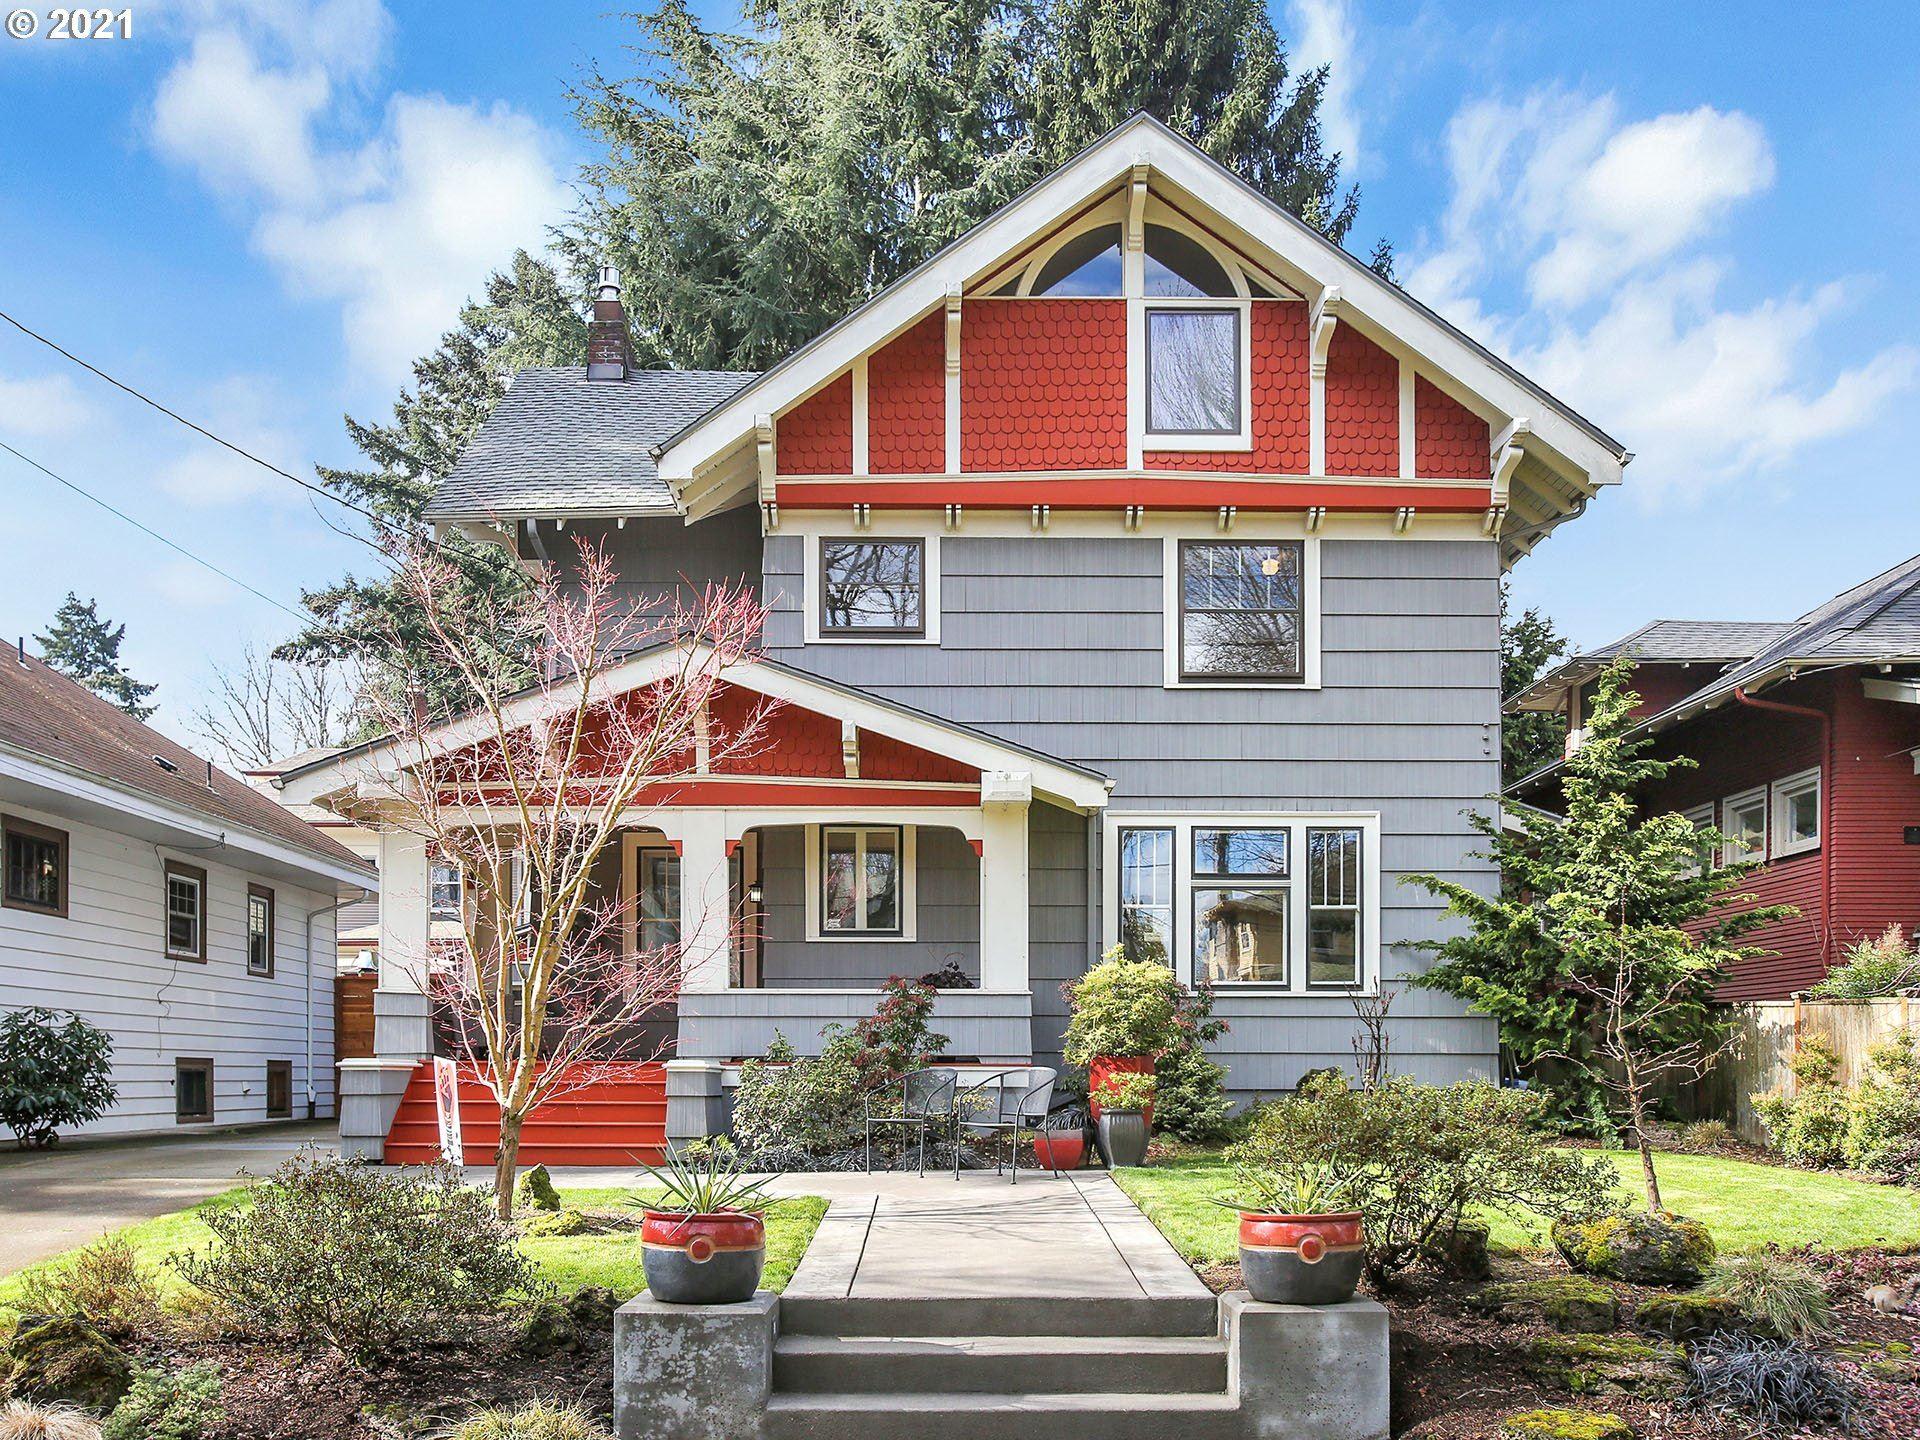 2601 NE 17TH AVE, Portland, OR 97212 - MLS#: 21488474